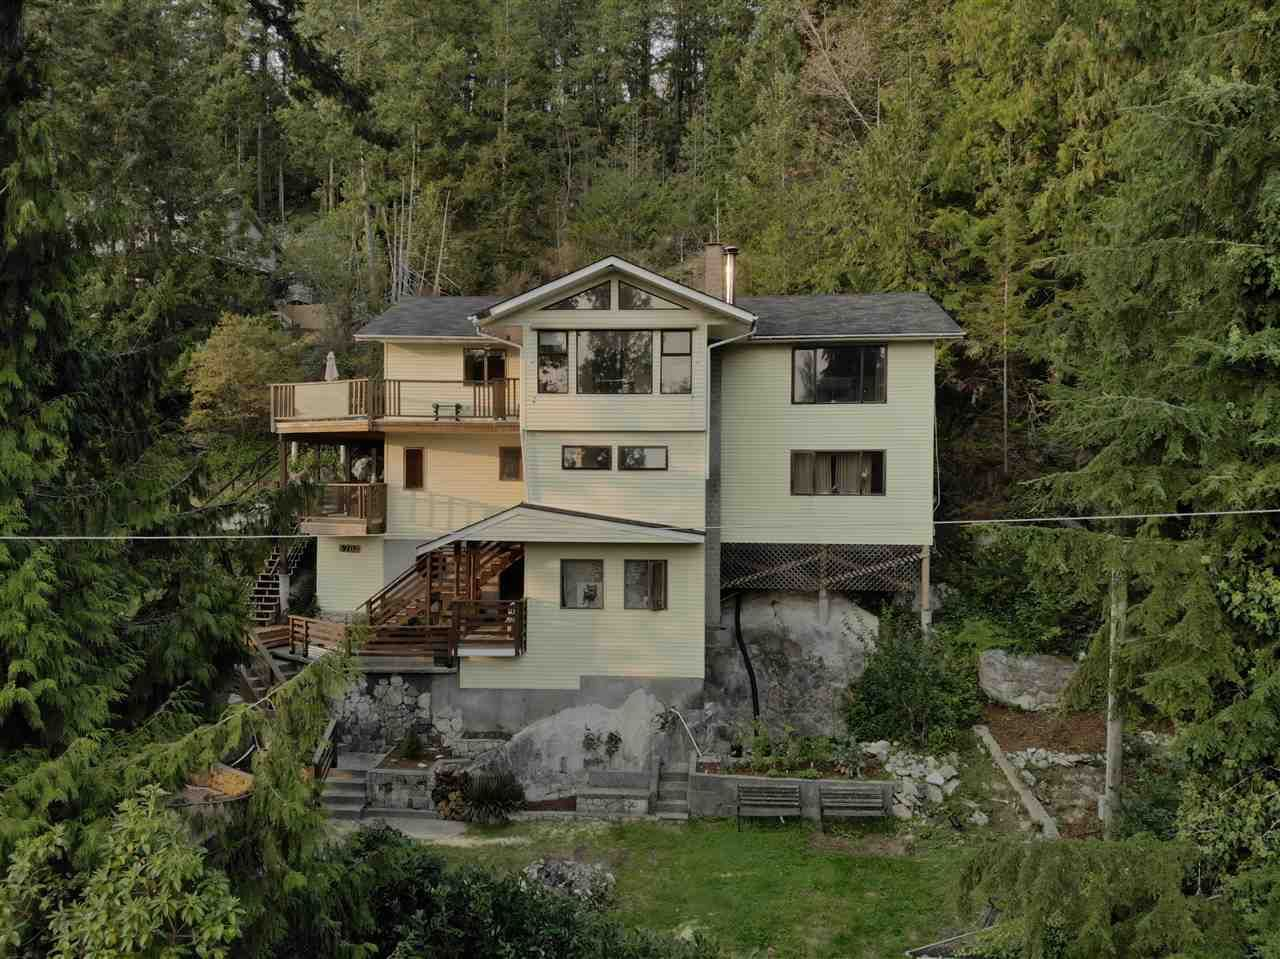 Main Photo: 5704 CARMEL PLACE in Sechelt: Sechelt District House for sale (Sunshine Coast)